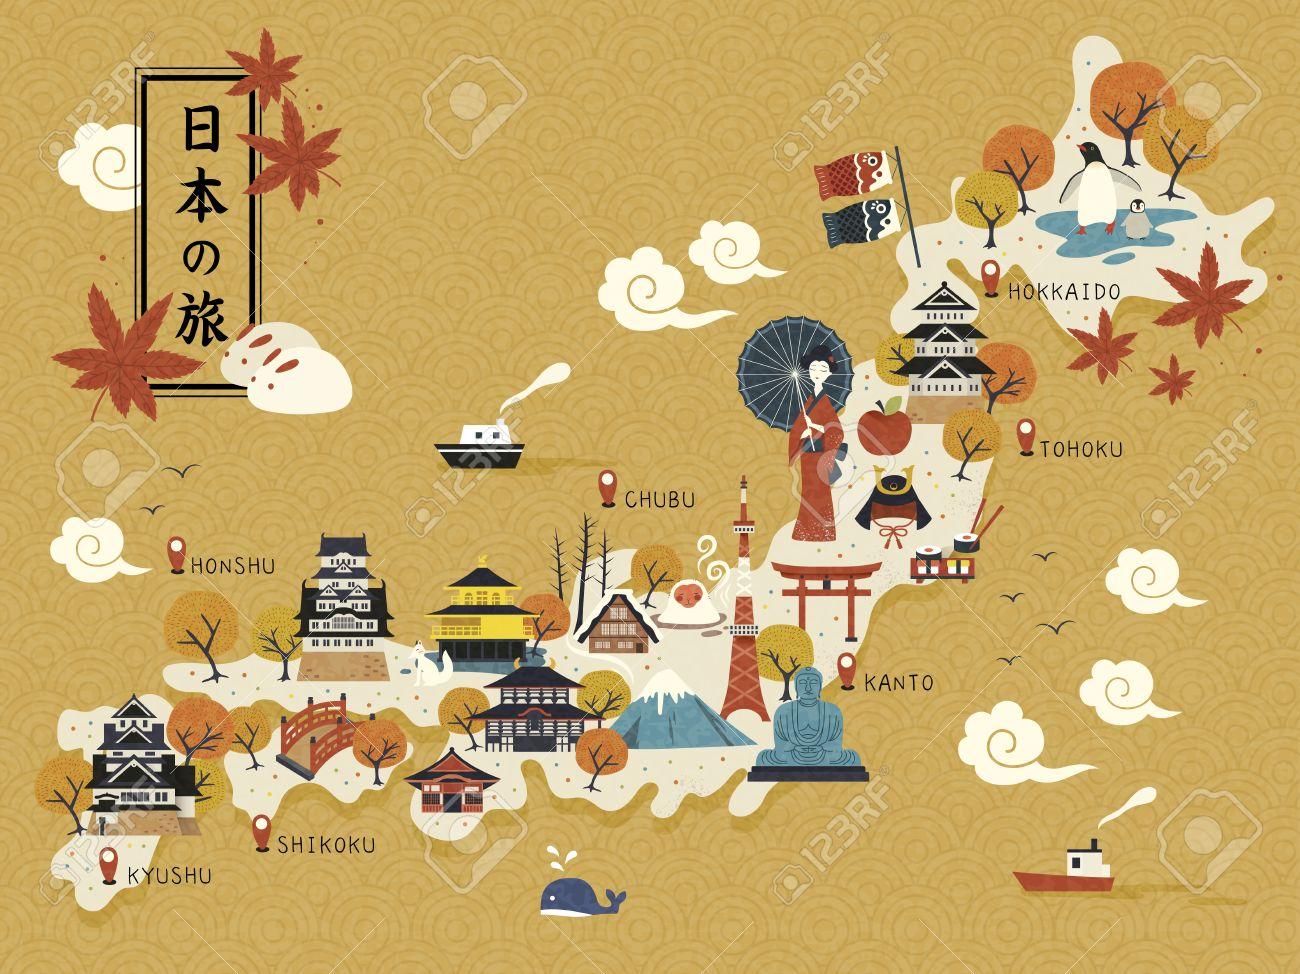 Japanese Travel Map Historical Landmarks On The Map Japan Travel - Japan map cartoon